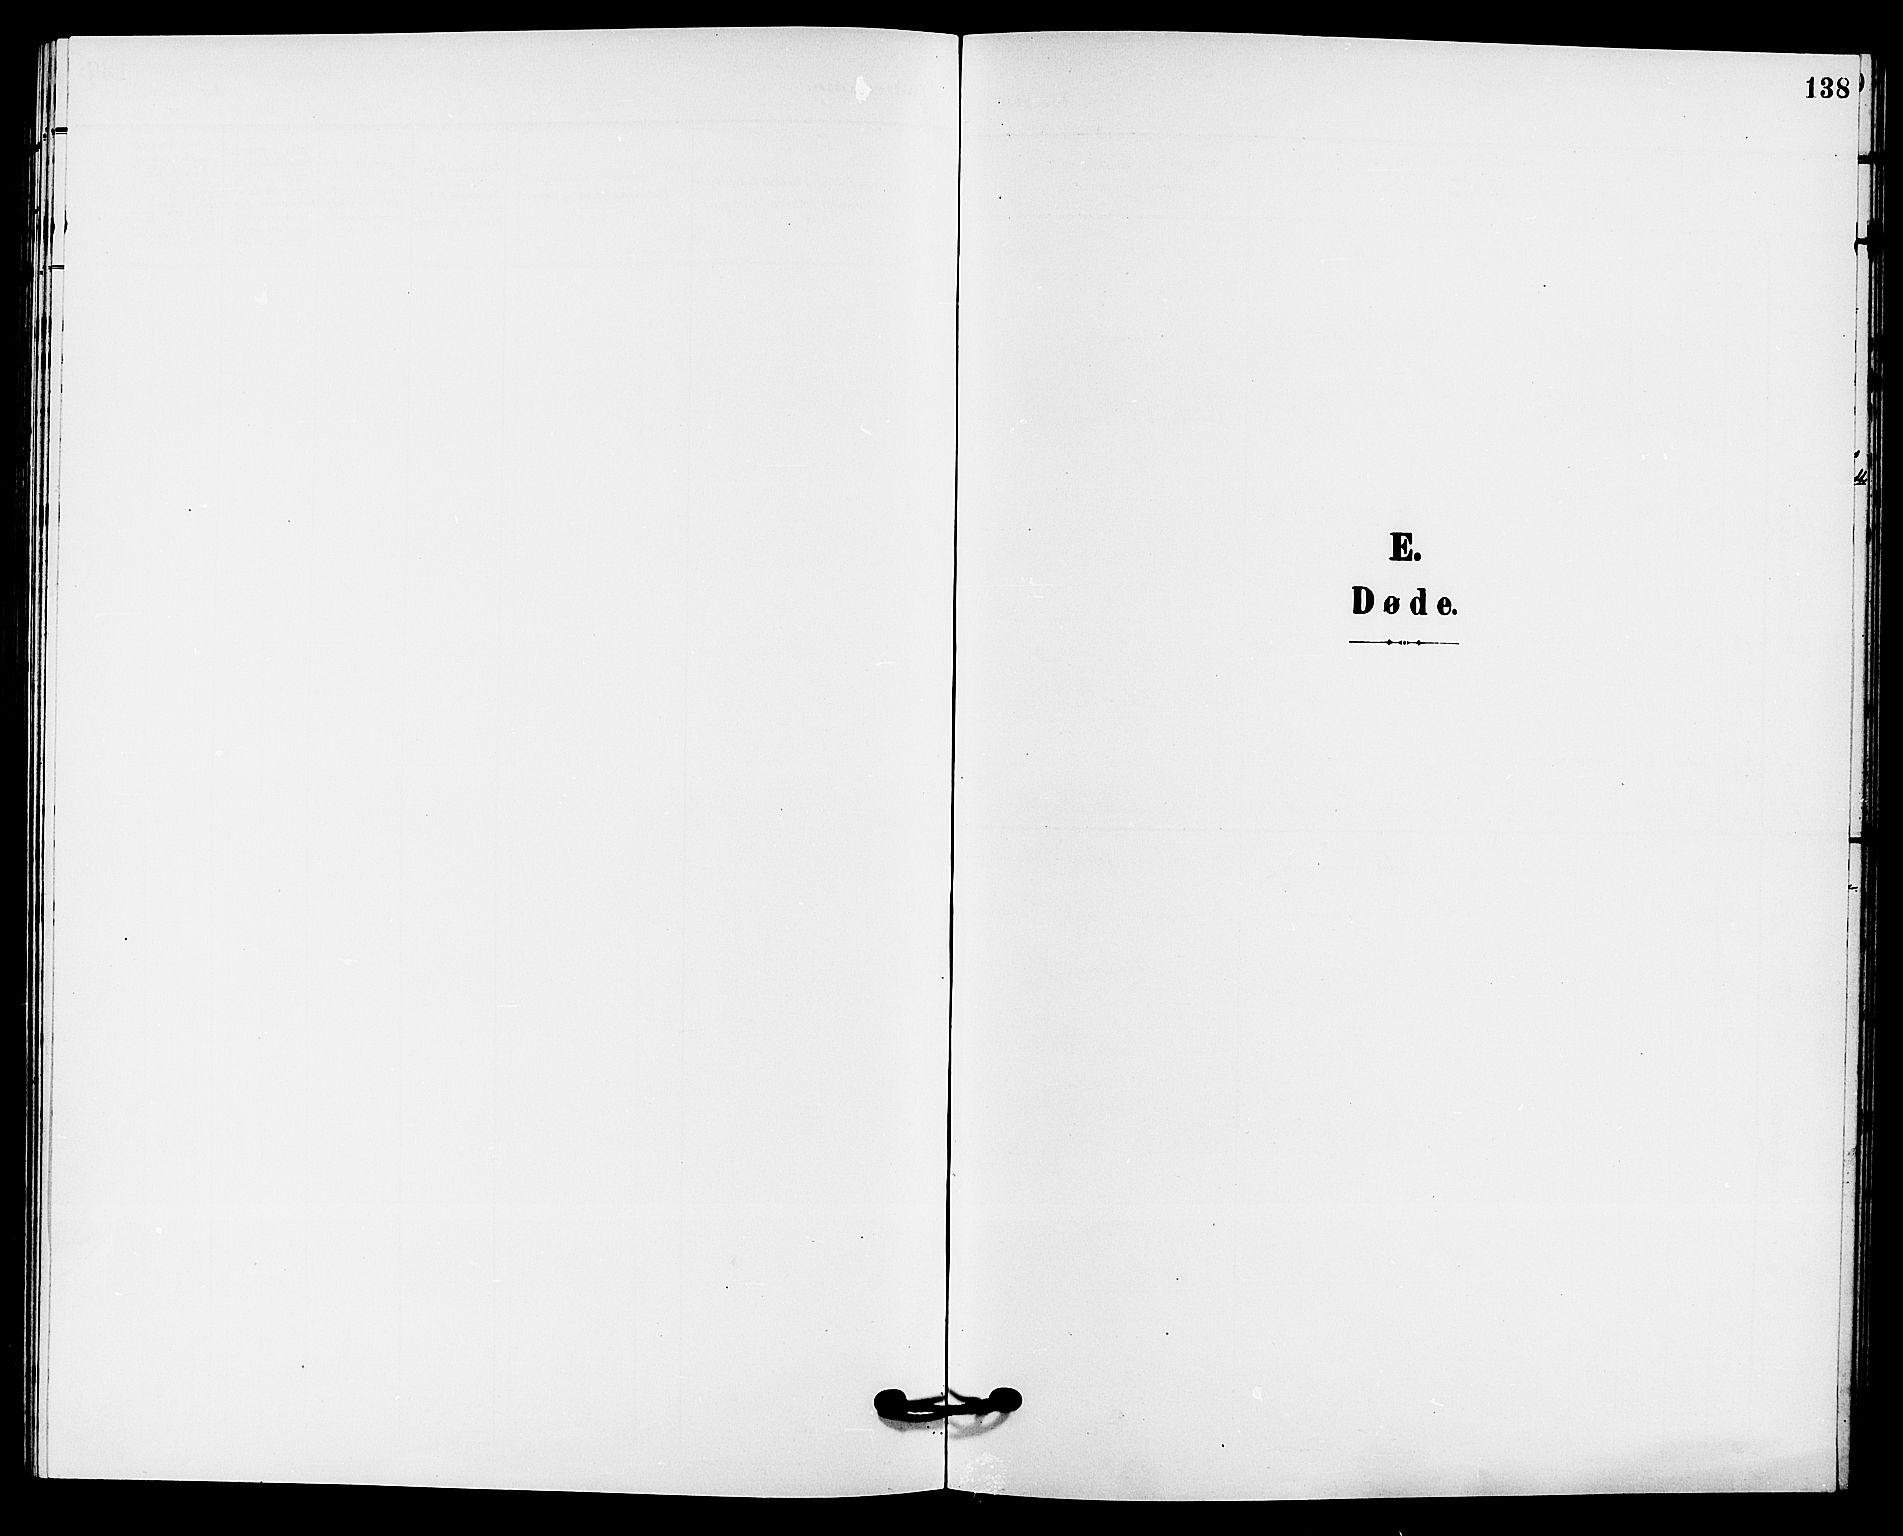 SAKO, Solum kirkebøker, G/Gb/L0004: Klokkerbok nr. II 4, 1898-1905, s. 138